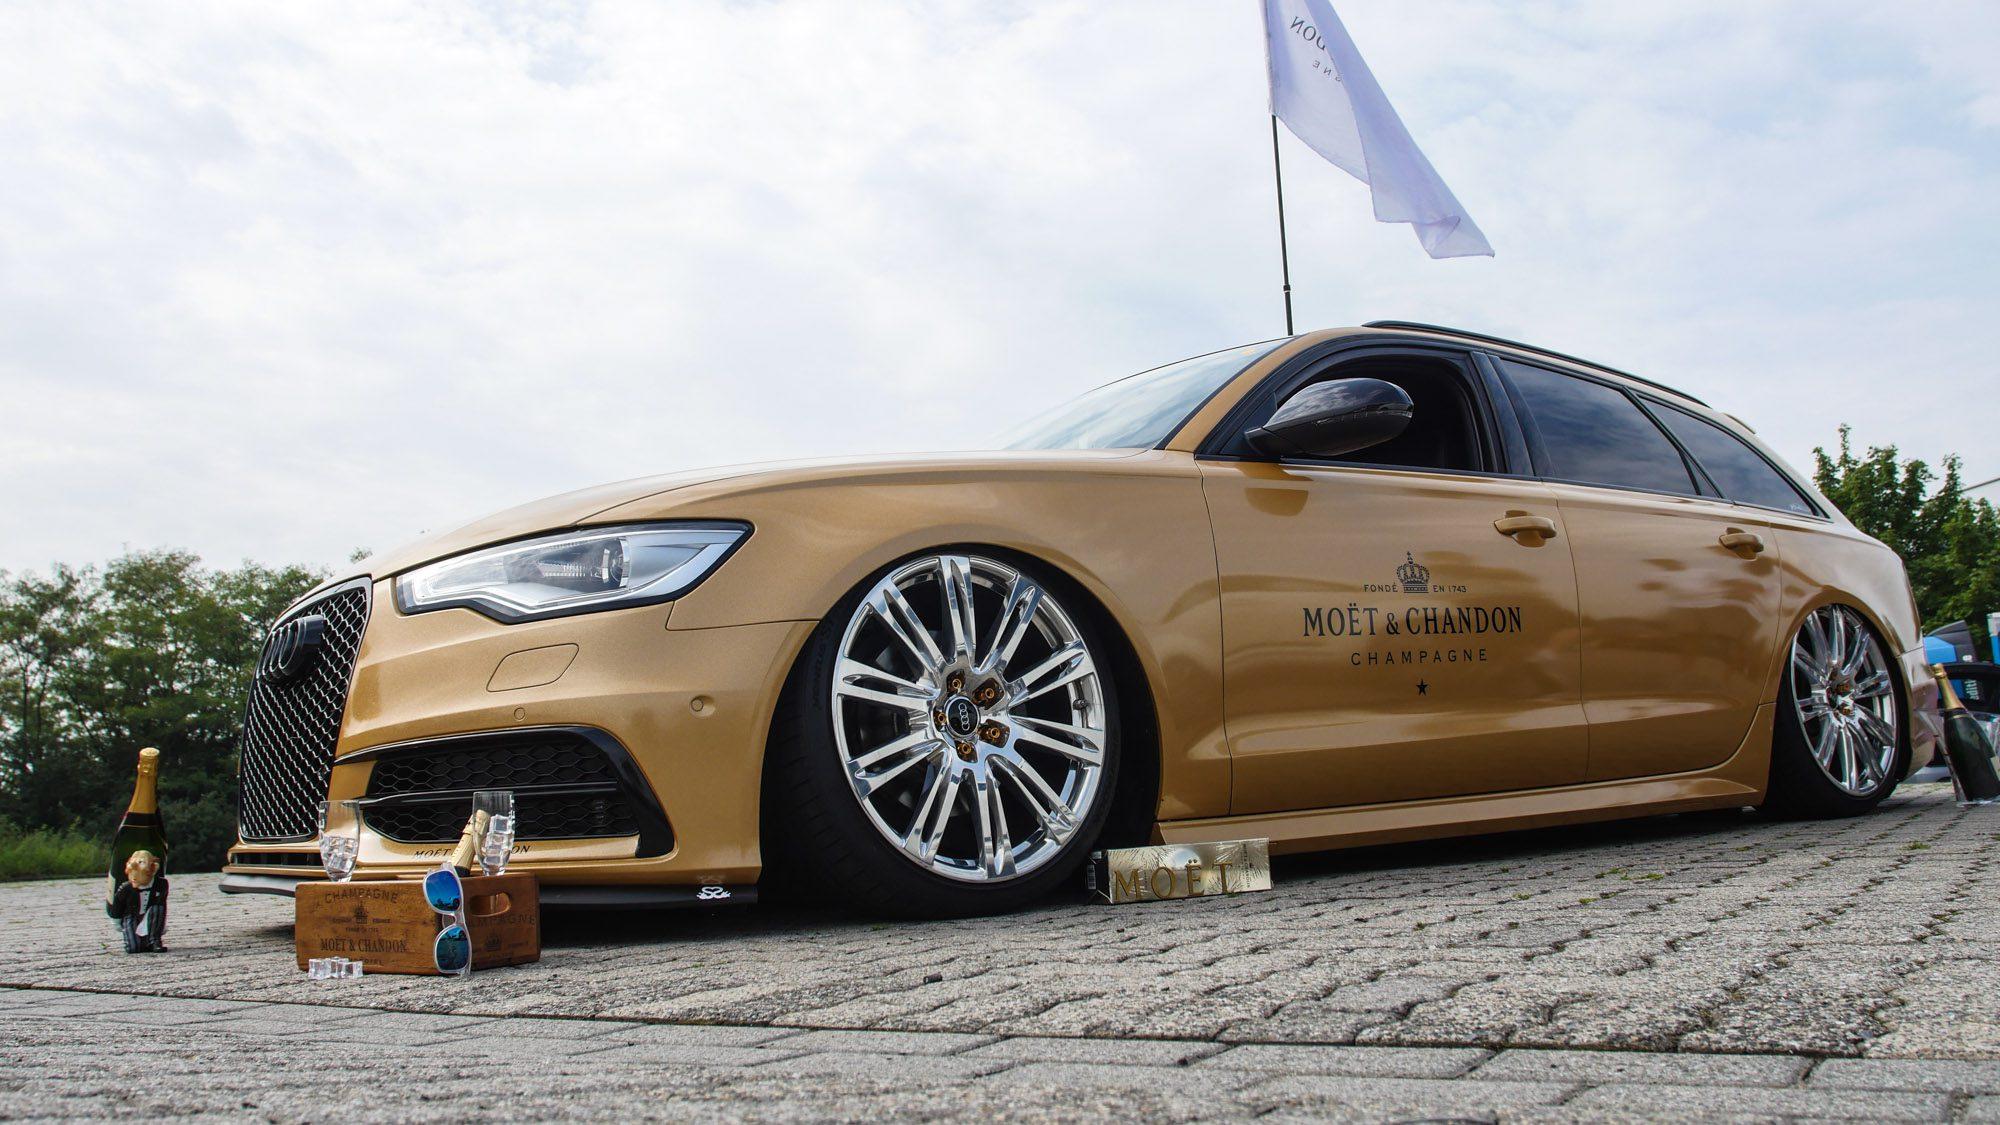 Seitenansicht des Audi A6 Avant